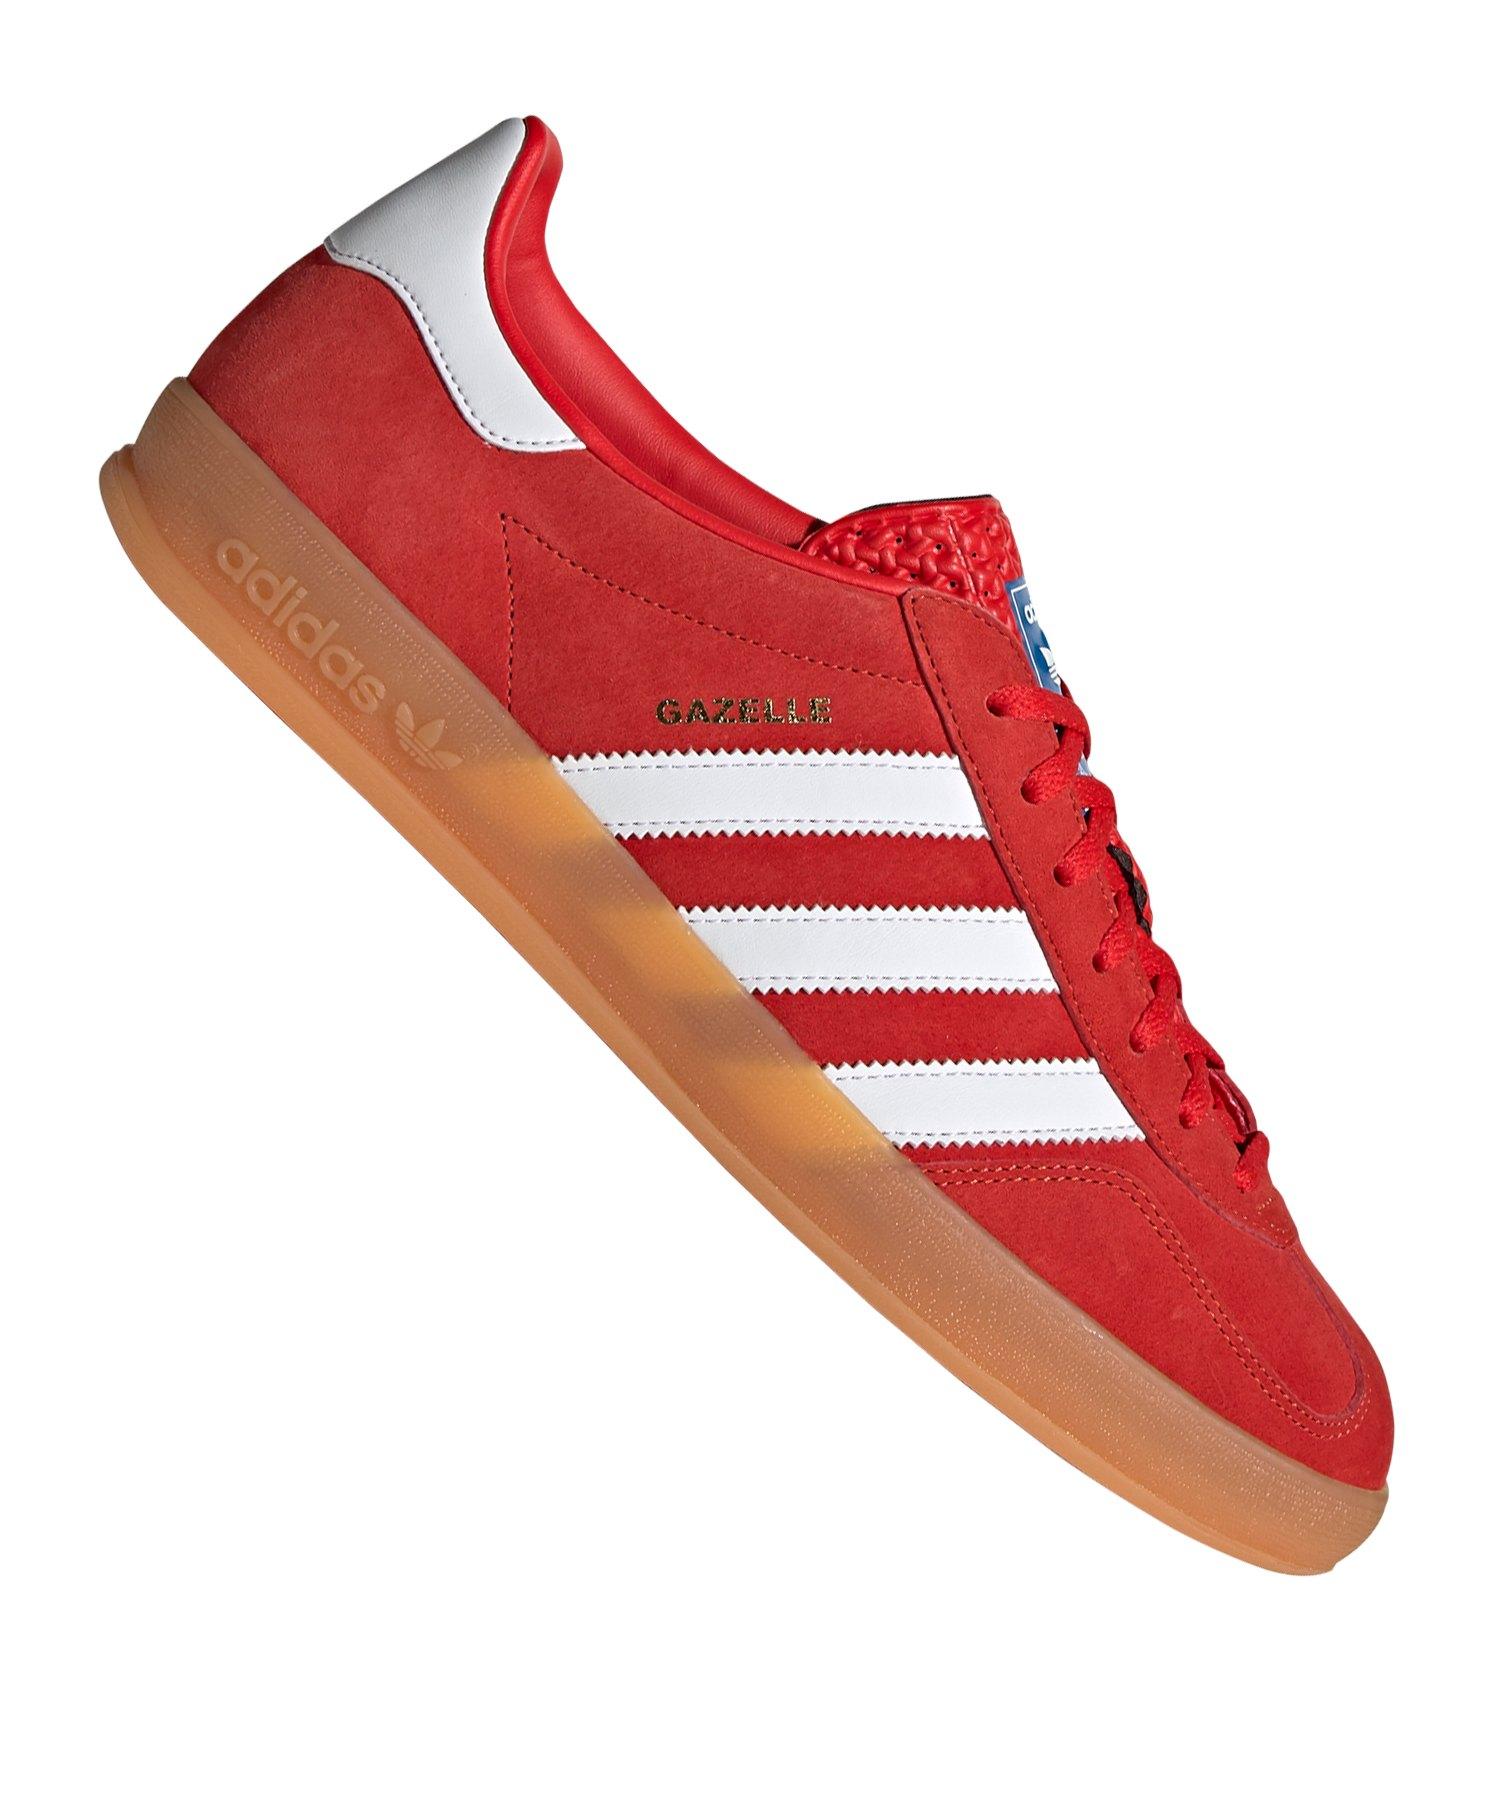 Details zu Adidas Kiel Schuhe Herren Originals Sneaker hellbraun blau Wildleder NEU B39564